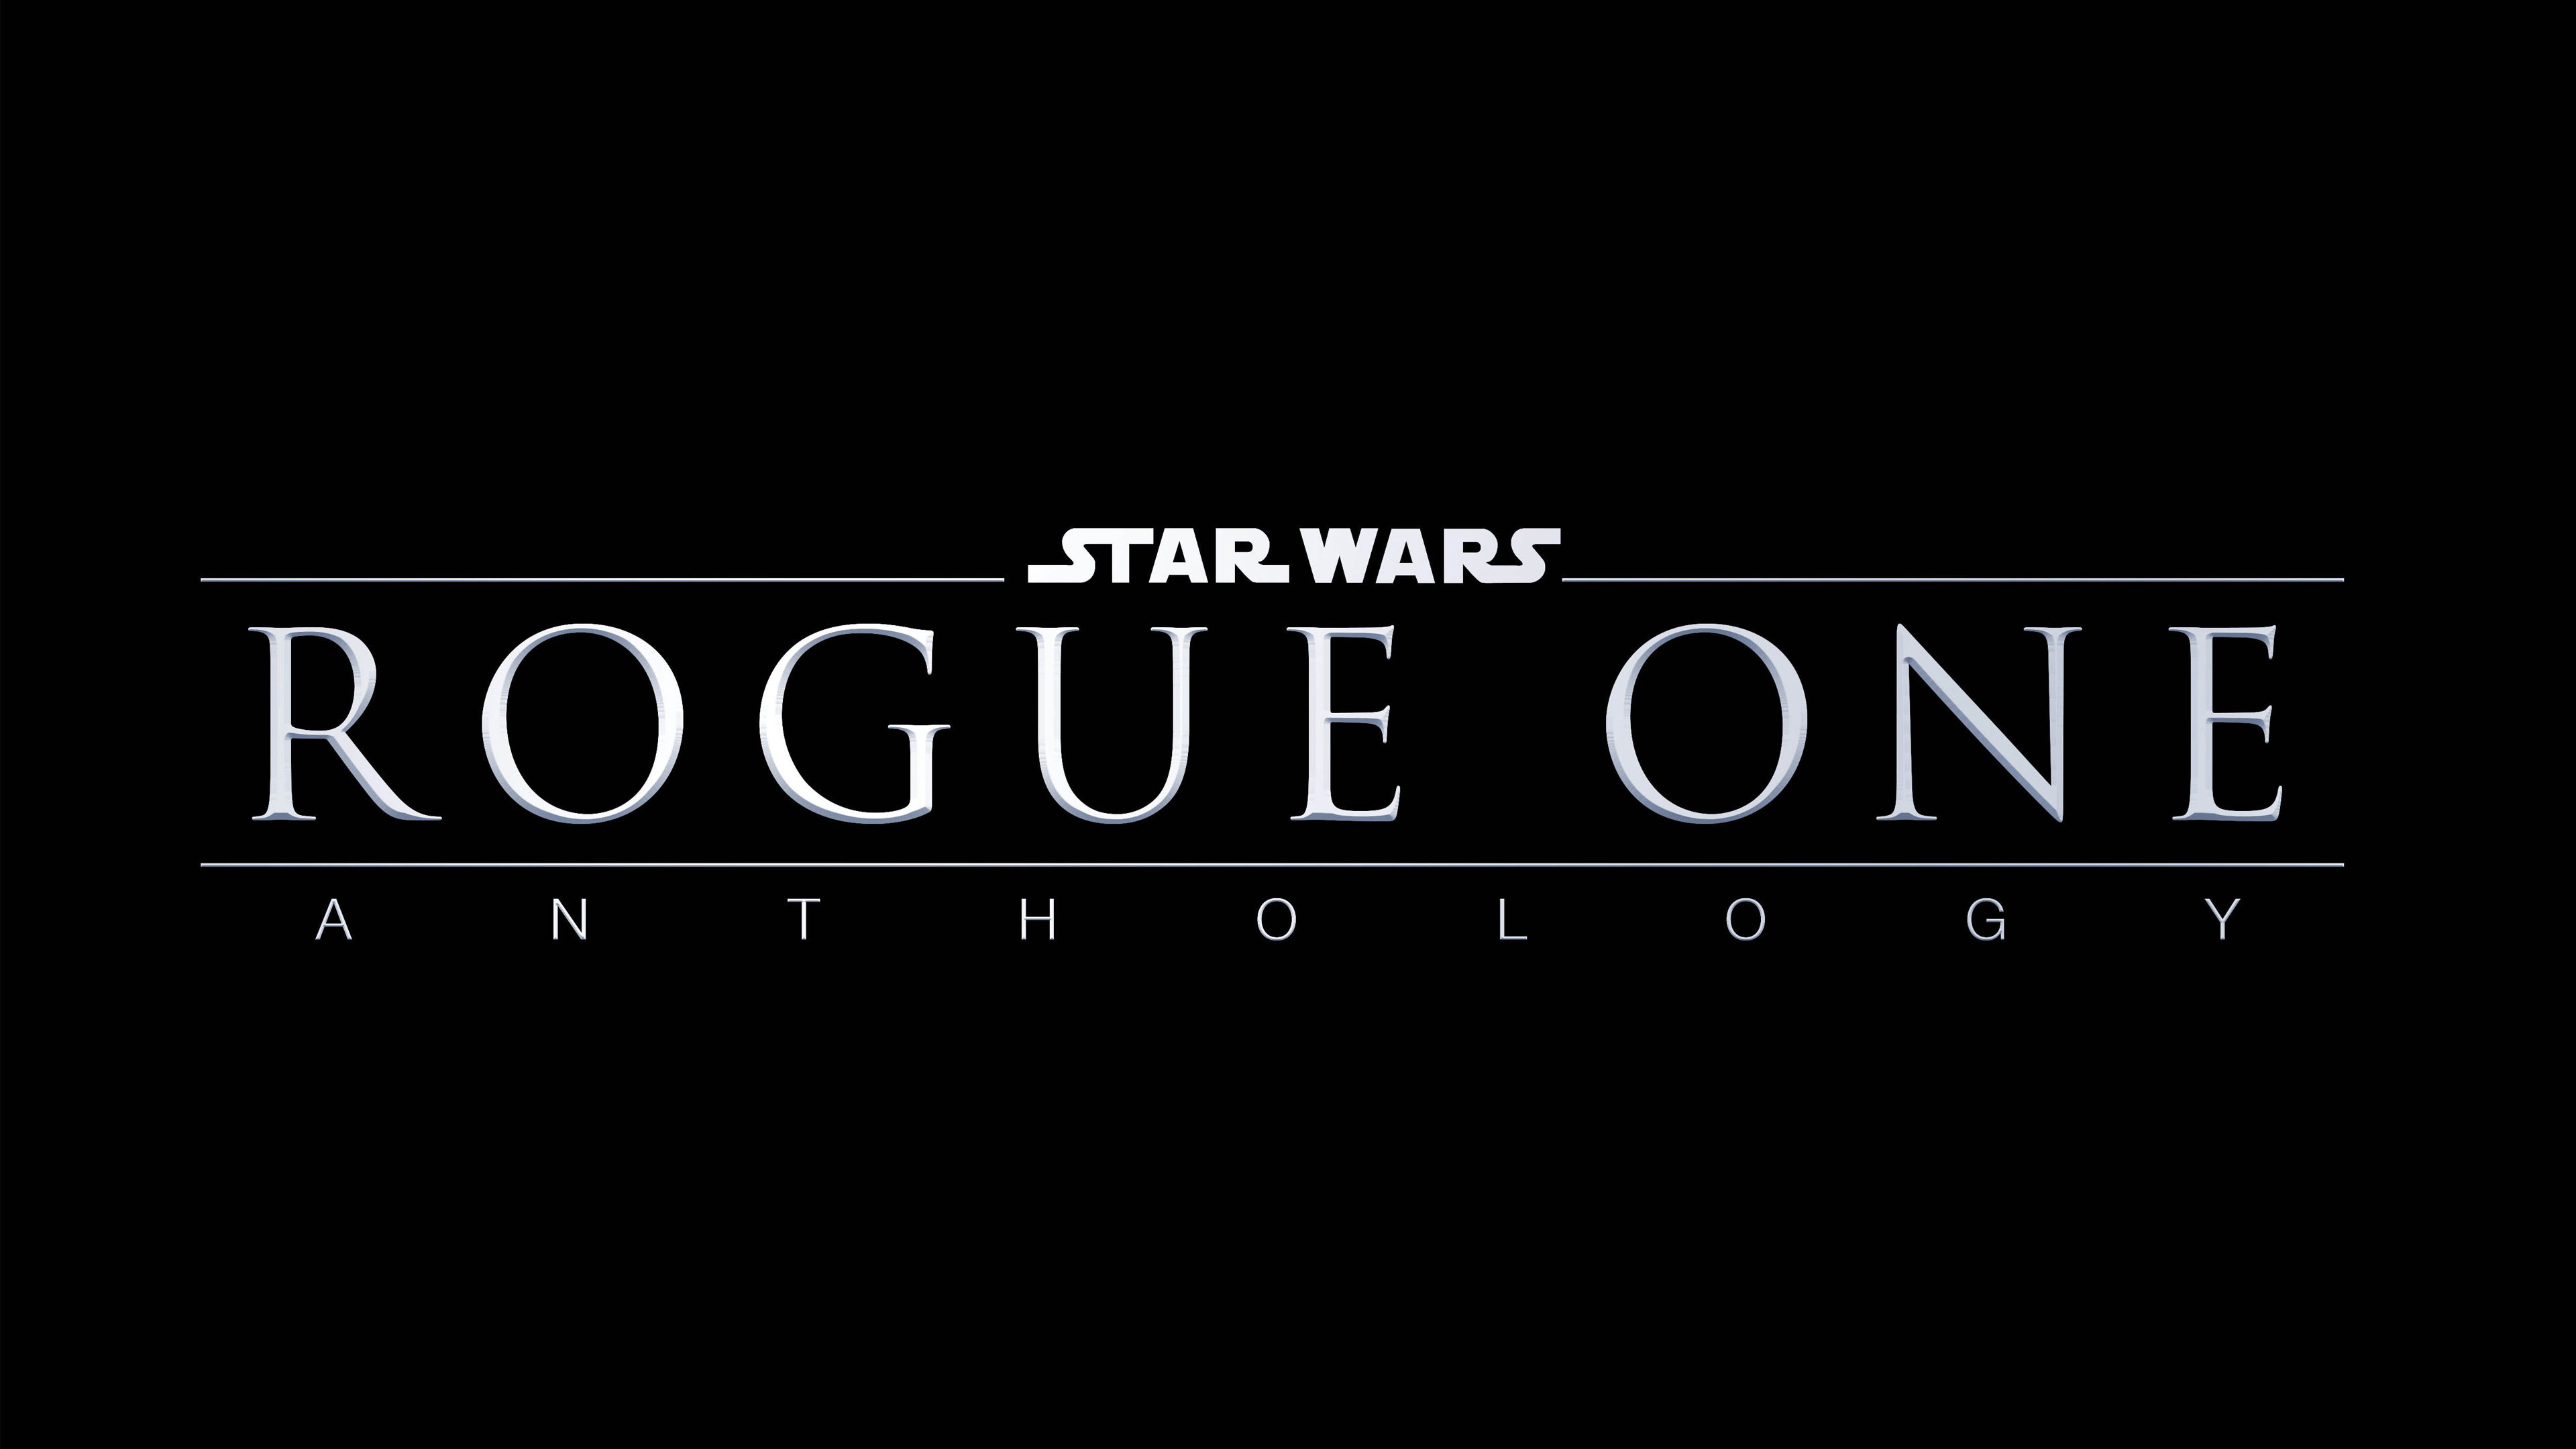 Rogue One: A Star Wars Story Logo wallpaper